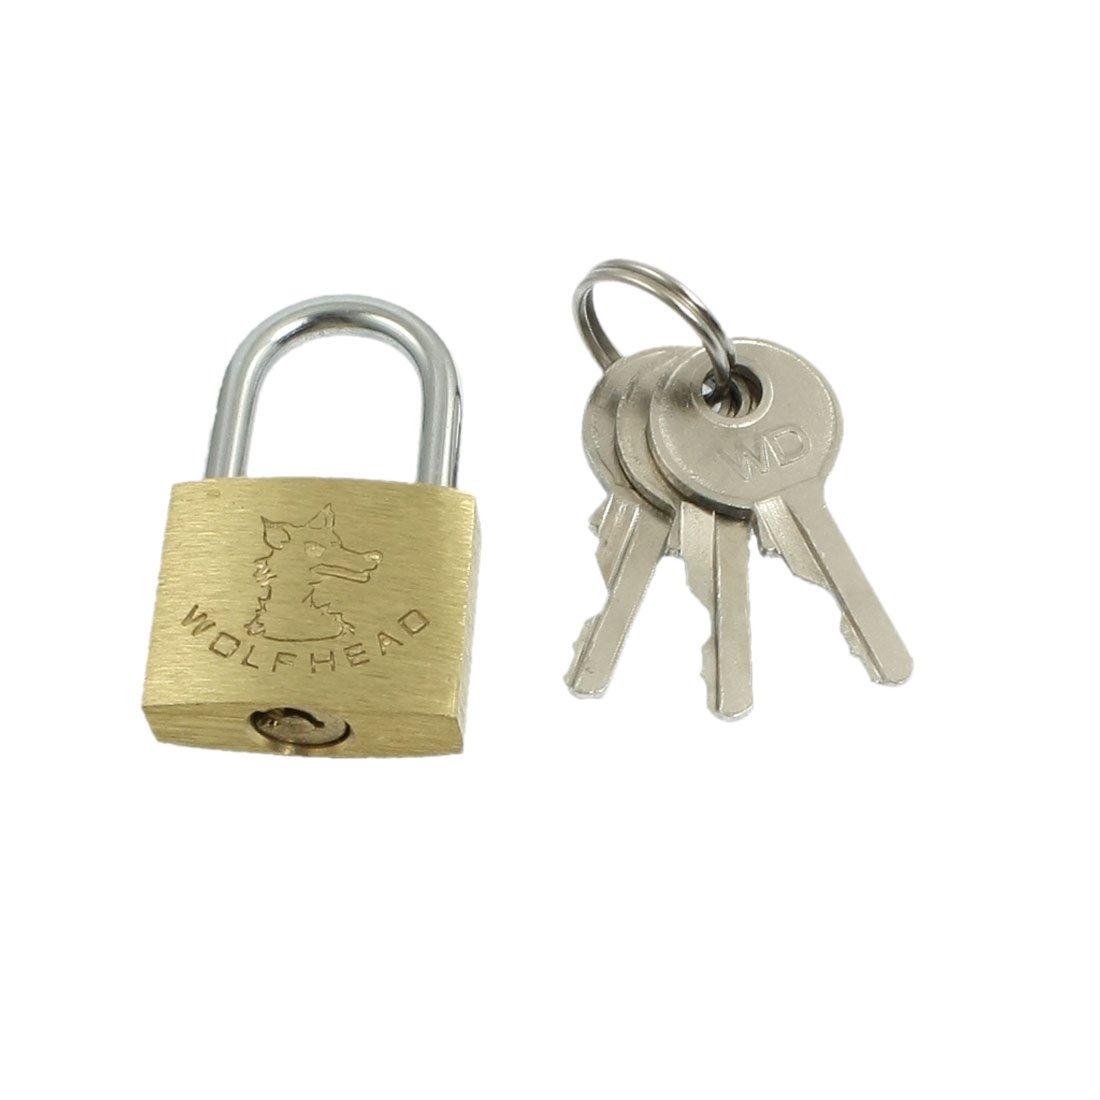 uxcell Cabinet Jewlery Box Packsack Brass 20mm Width Padlock Gold Tone w 3 Pcs Keys